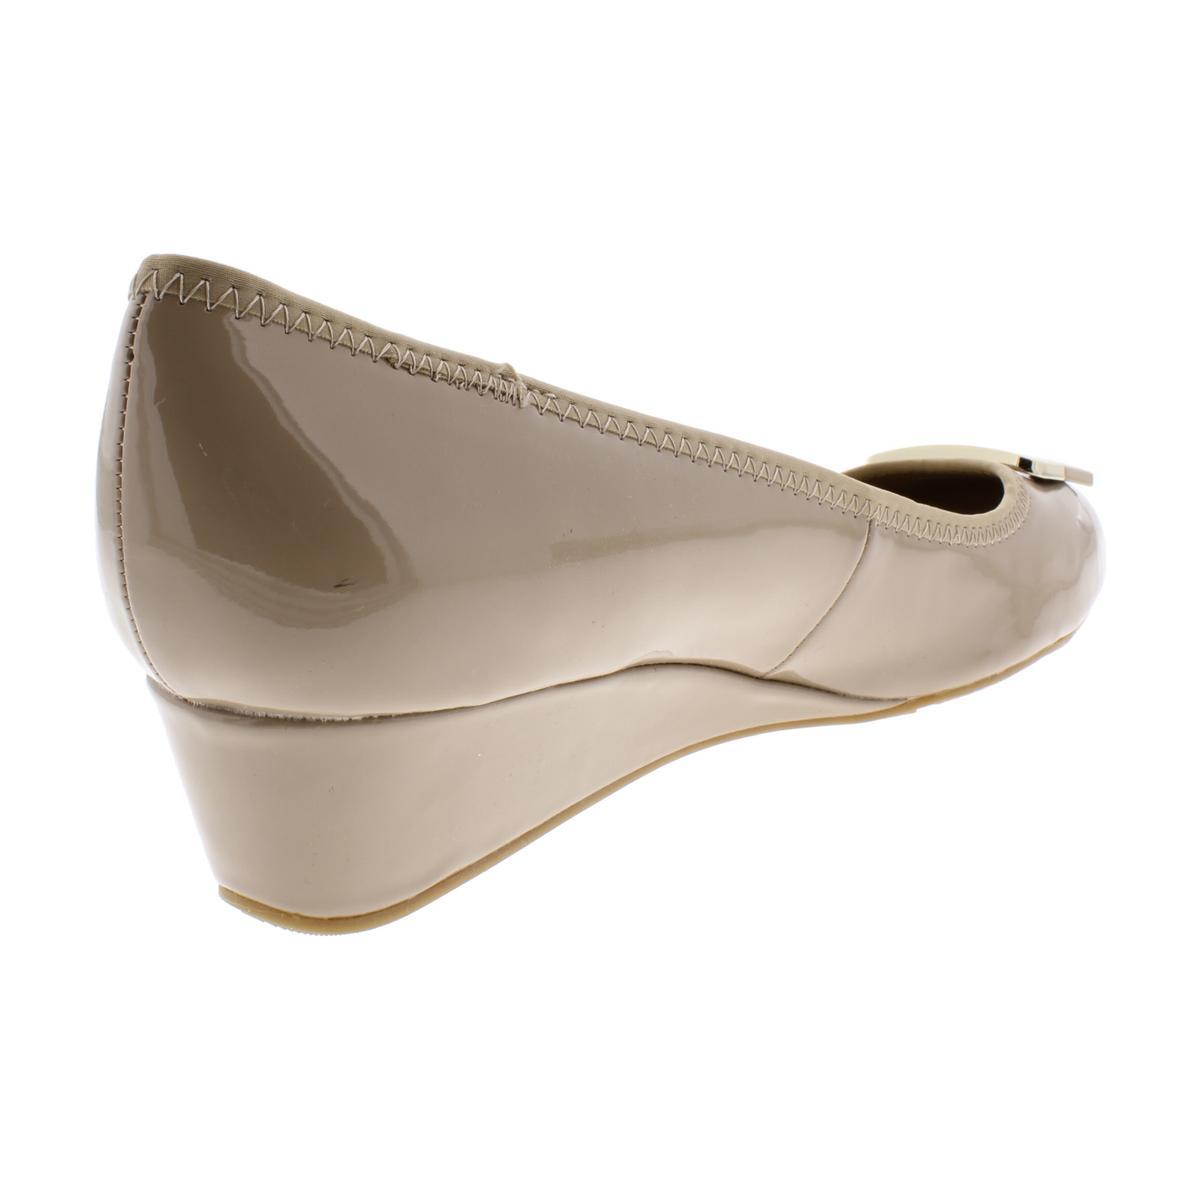 Bandolino-Womens-Tad-Padded-Insole-Round-Toe-Dressy-Wedge-Heels-Shoes-BHFO-3570 thumbnail 6